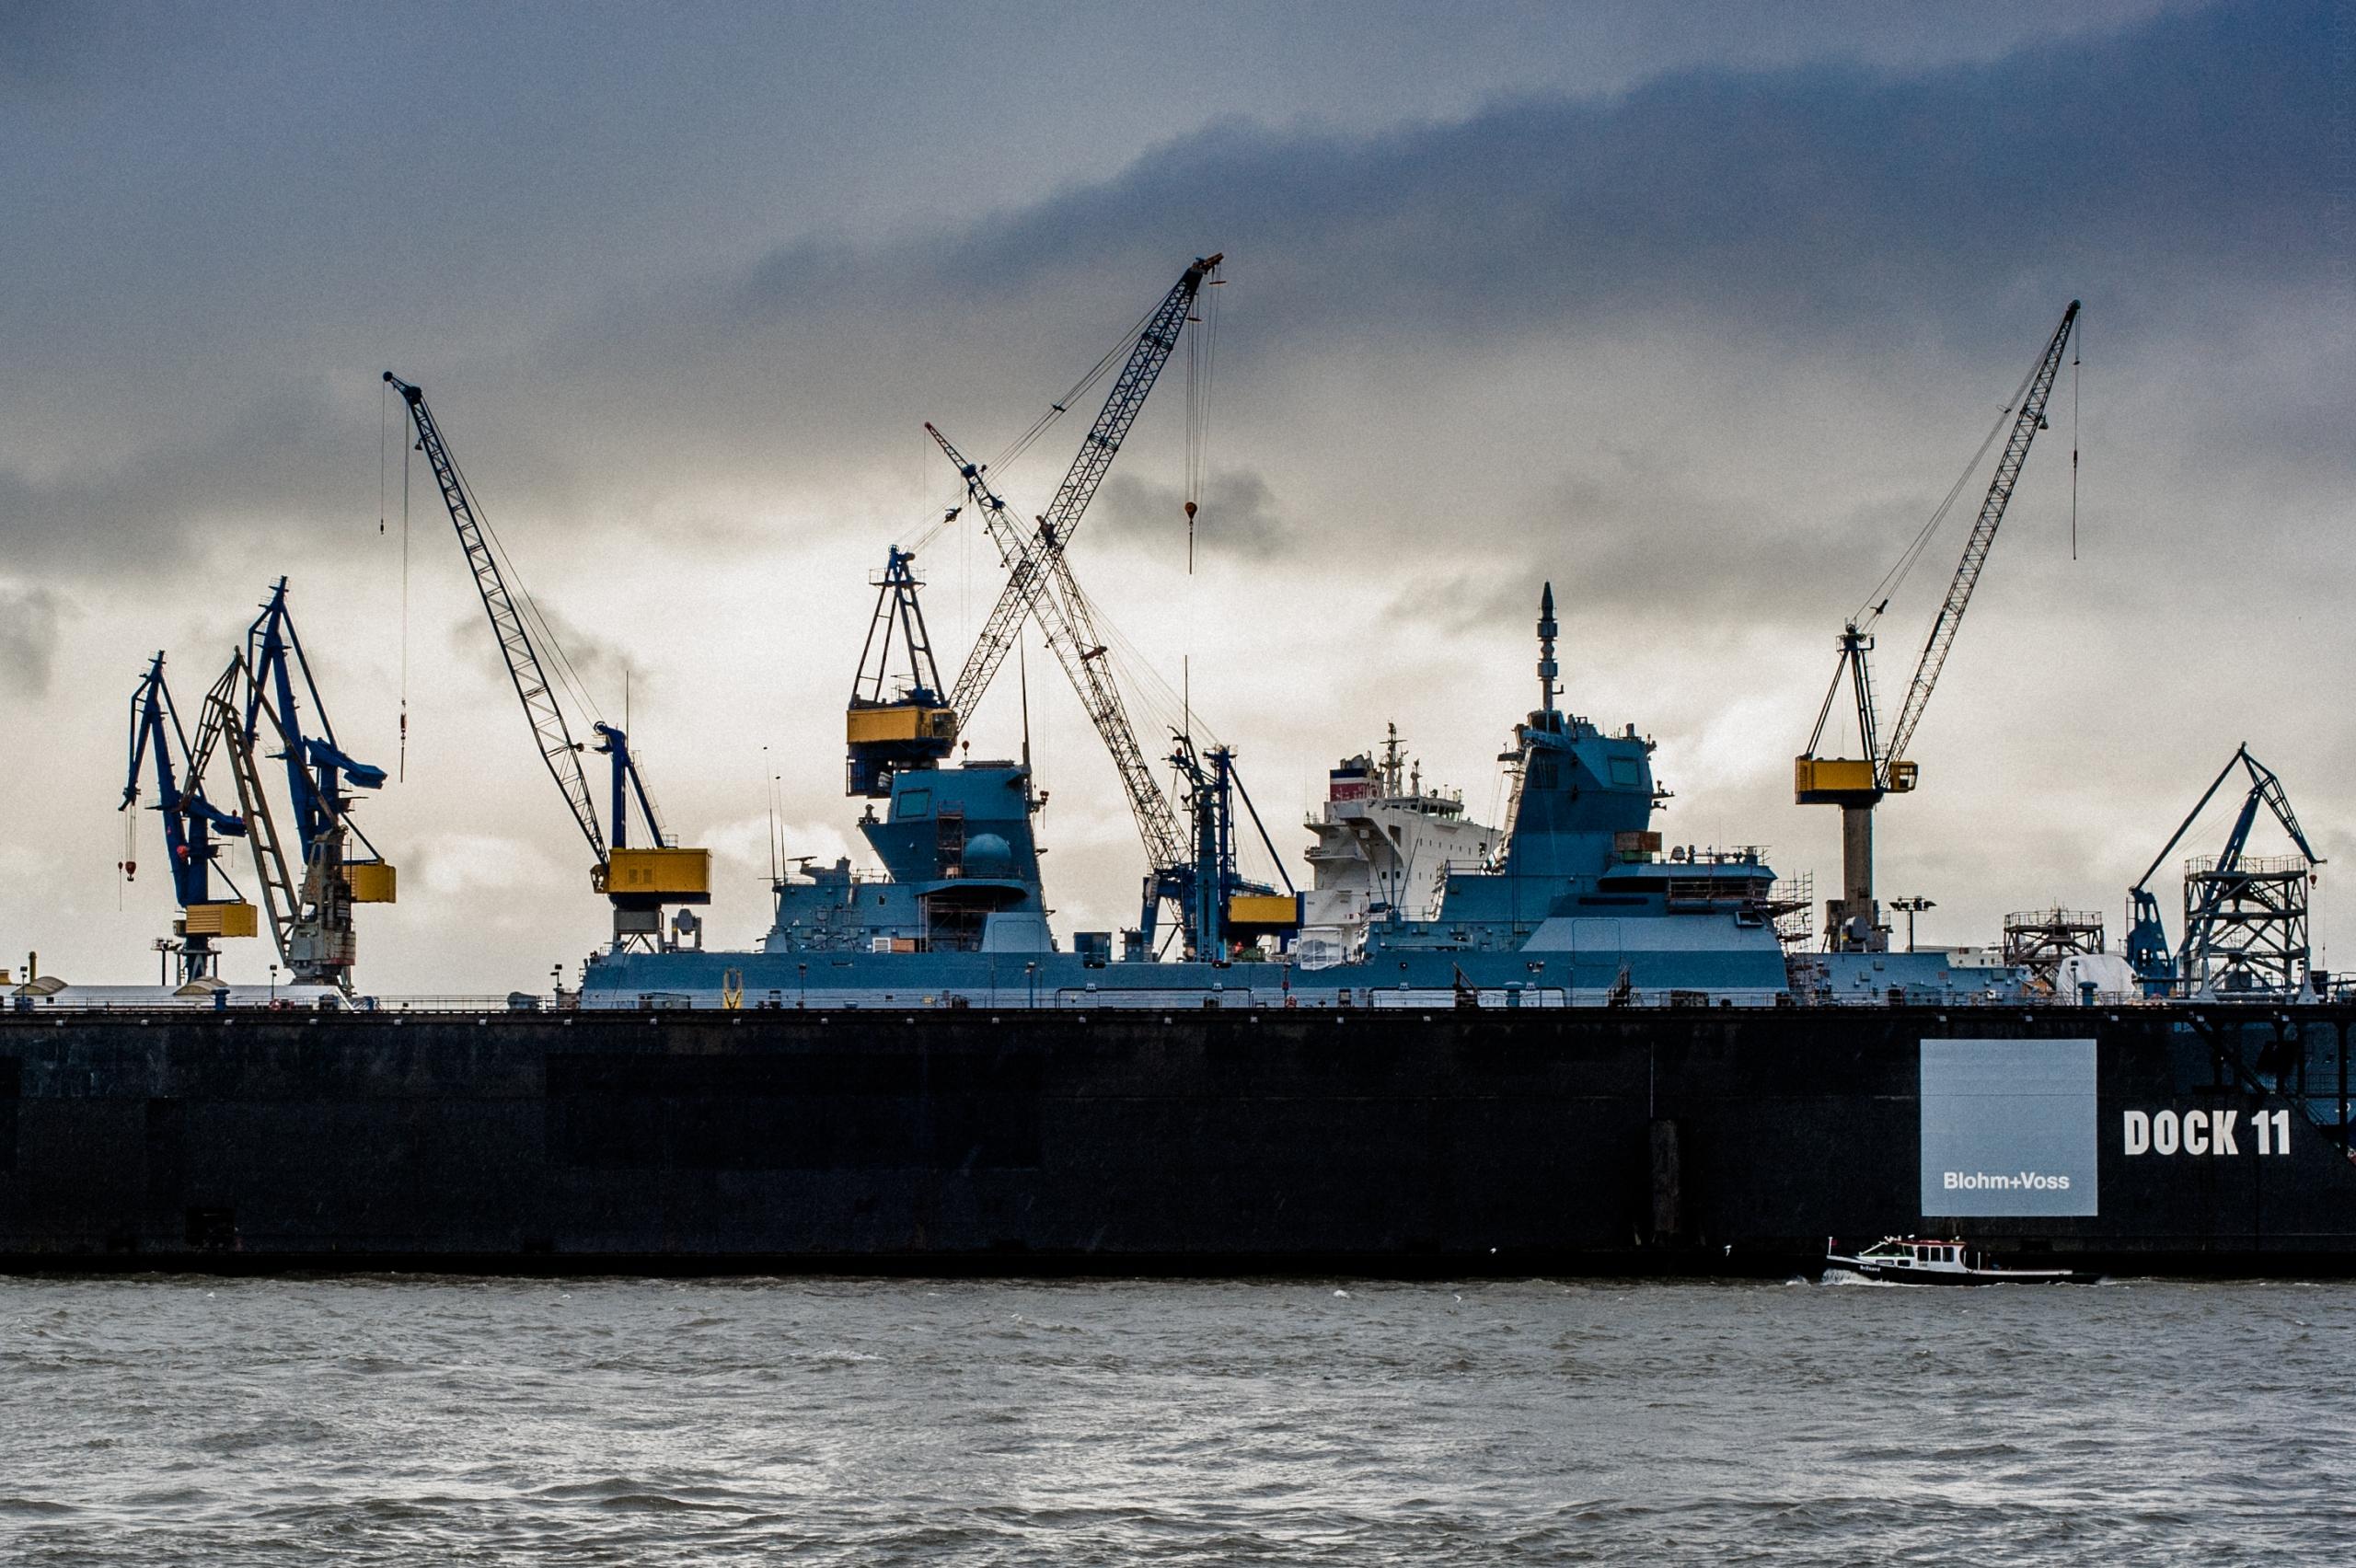 Dock 11 Hambourg - Dock 11 Hamburg